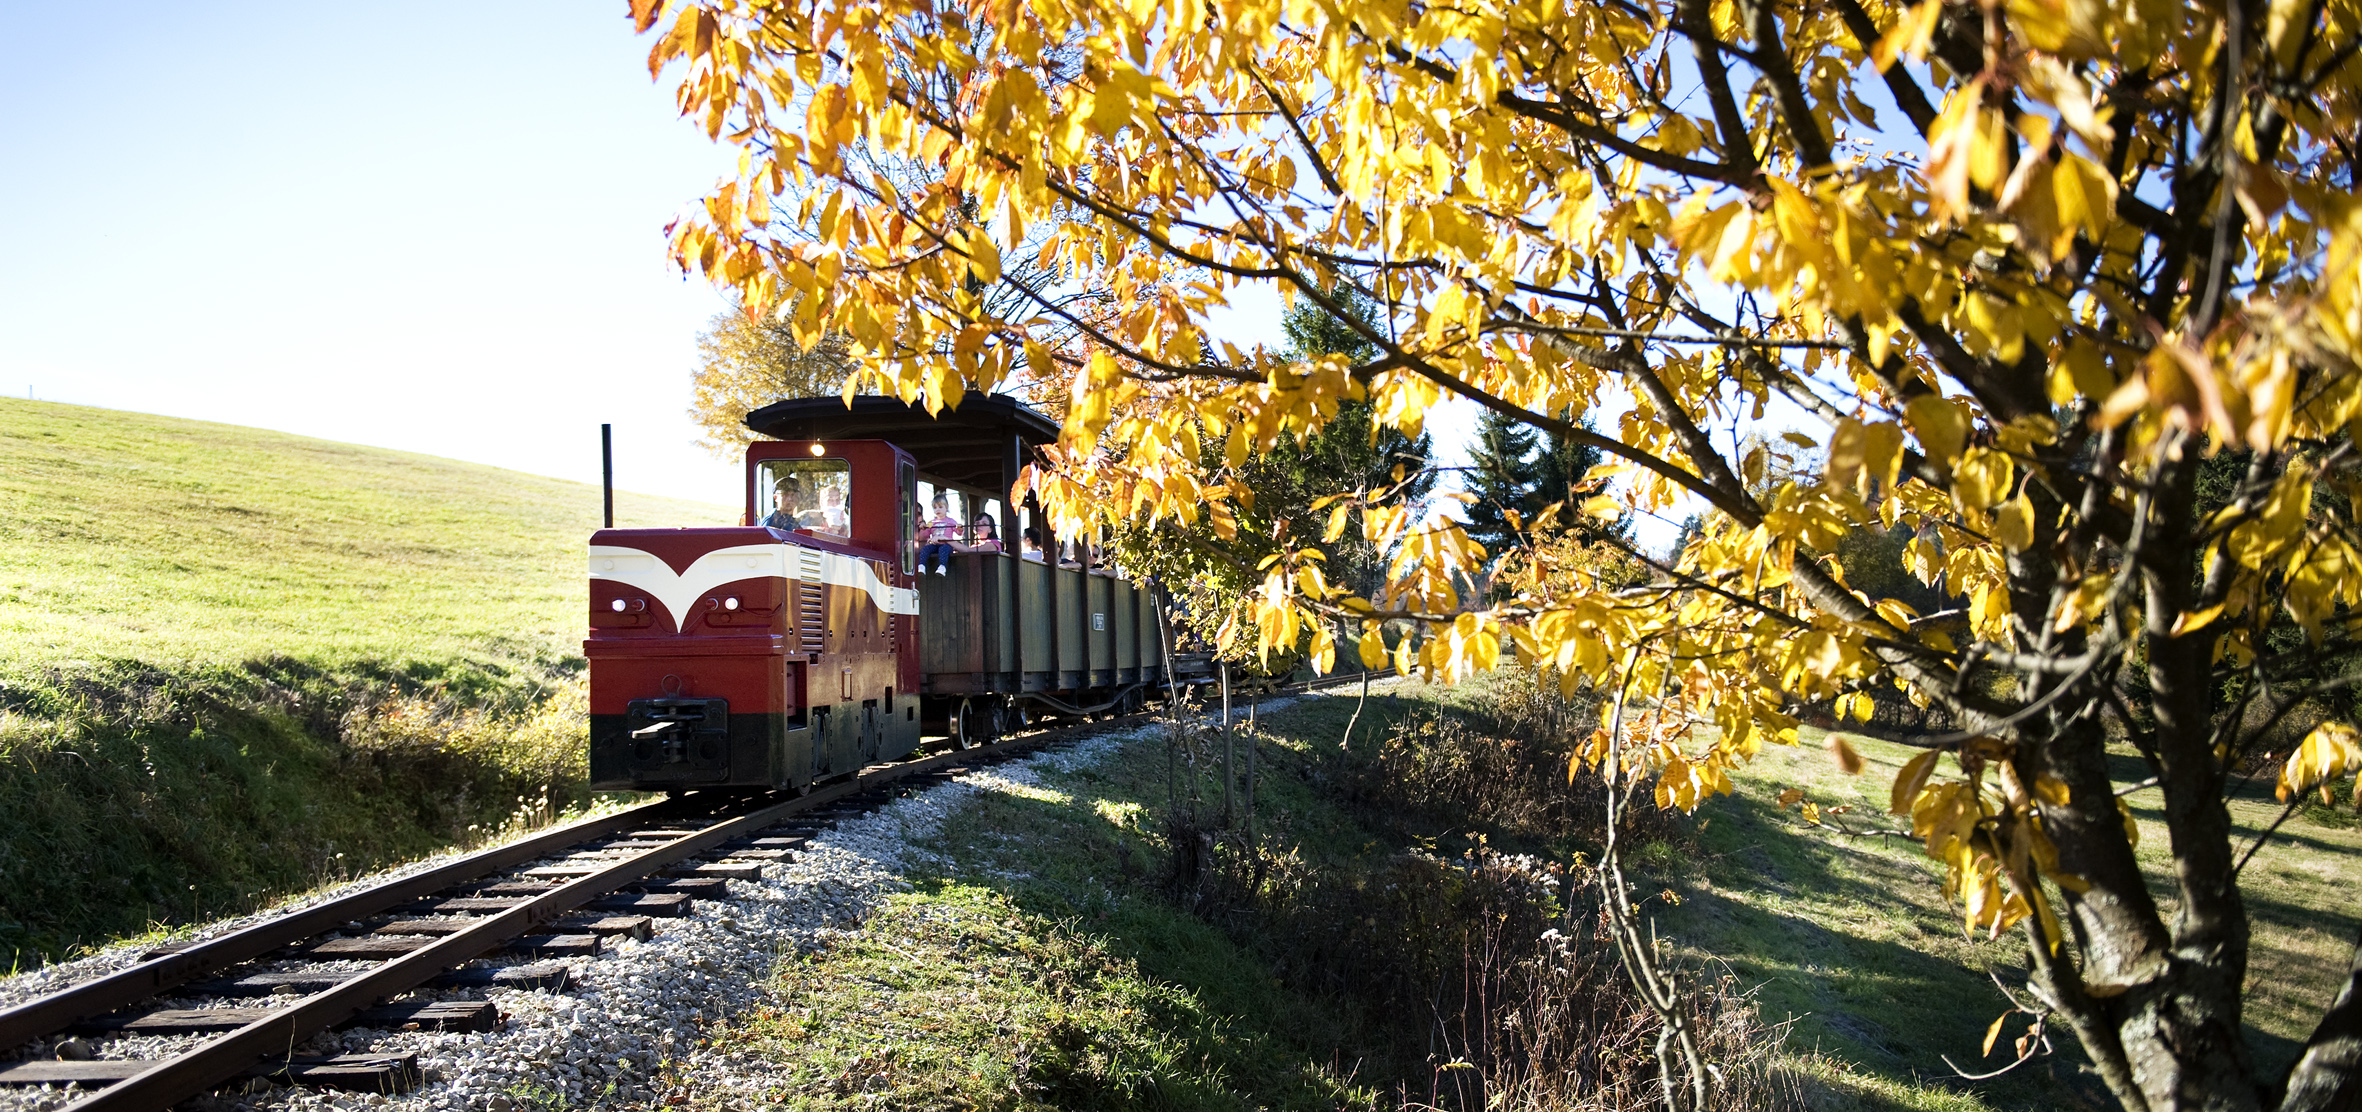 OLZ jesen vlak